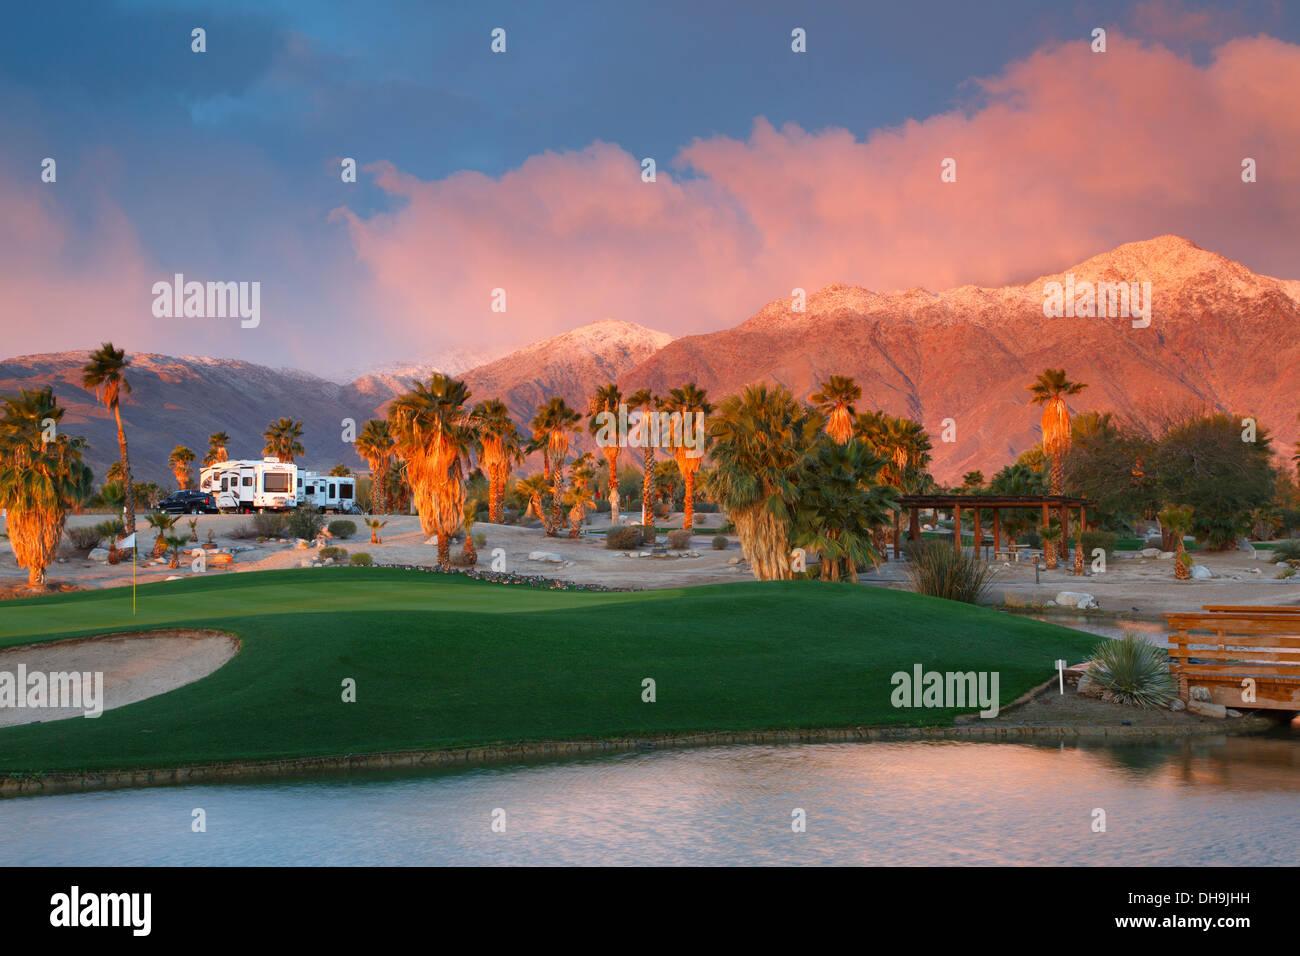 Springs at Borrego RV Resort, Borrego Springs, Anza-Borrego Desert State Park, California. - Stock Image